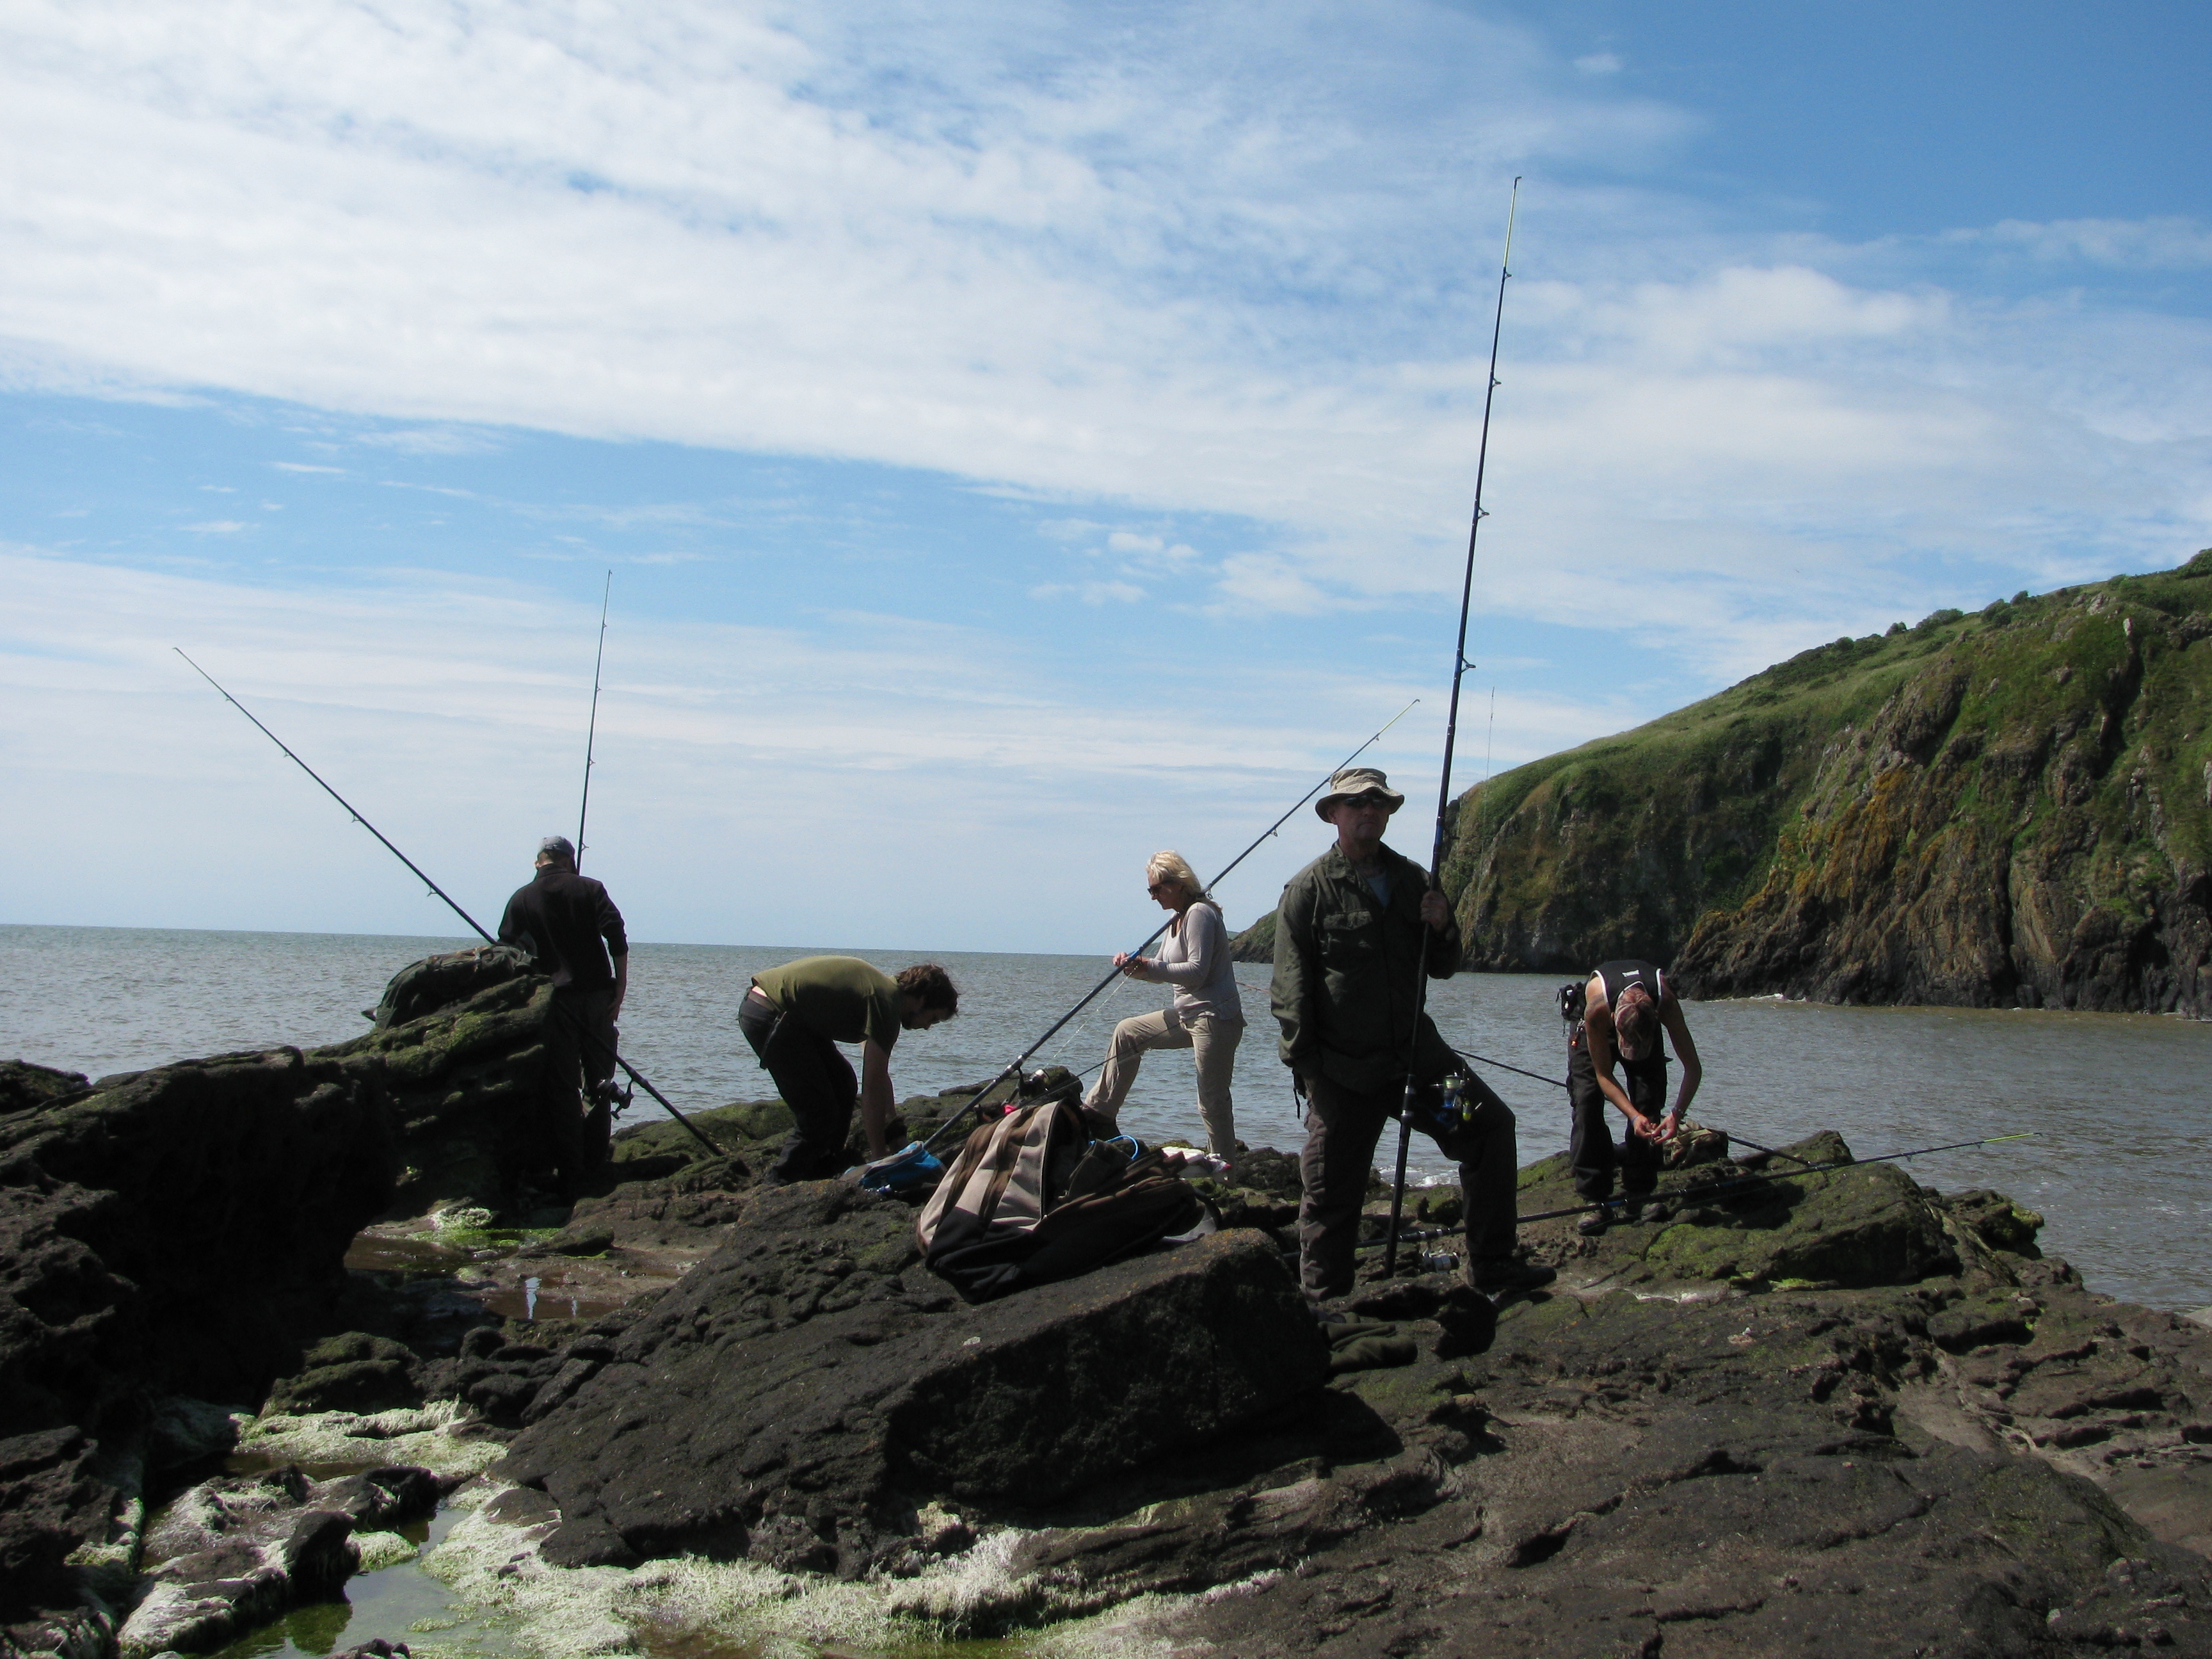 Fishing off the rocks on a coastal bushcraft course.